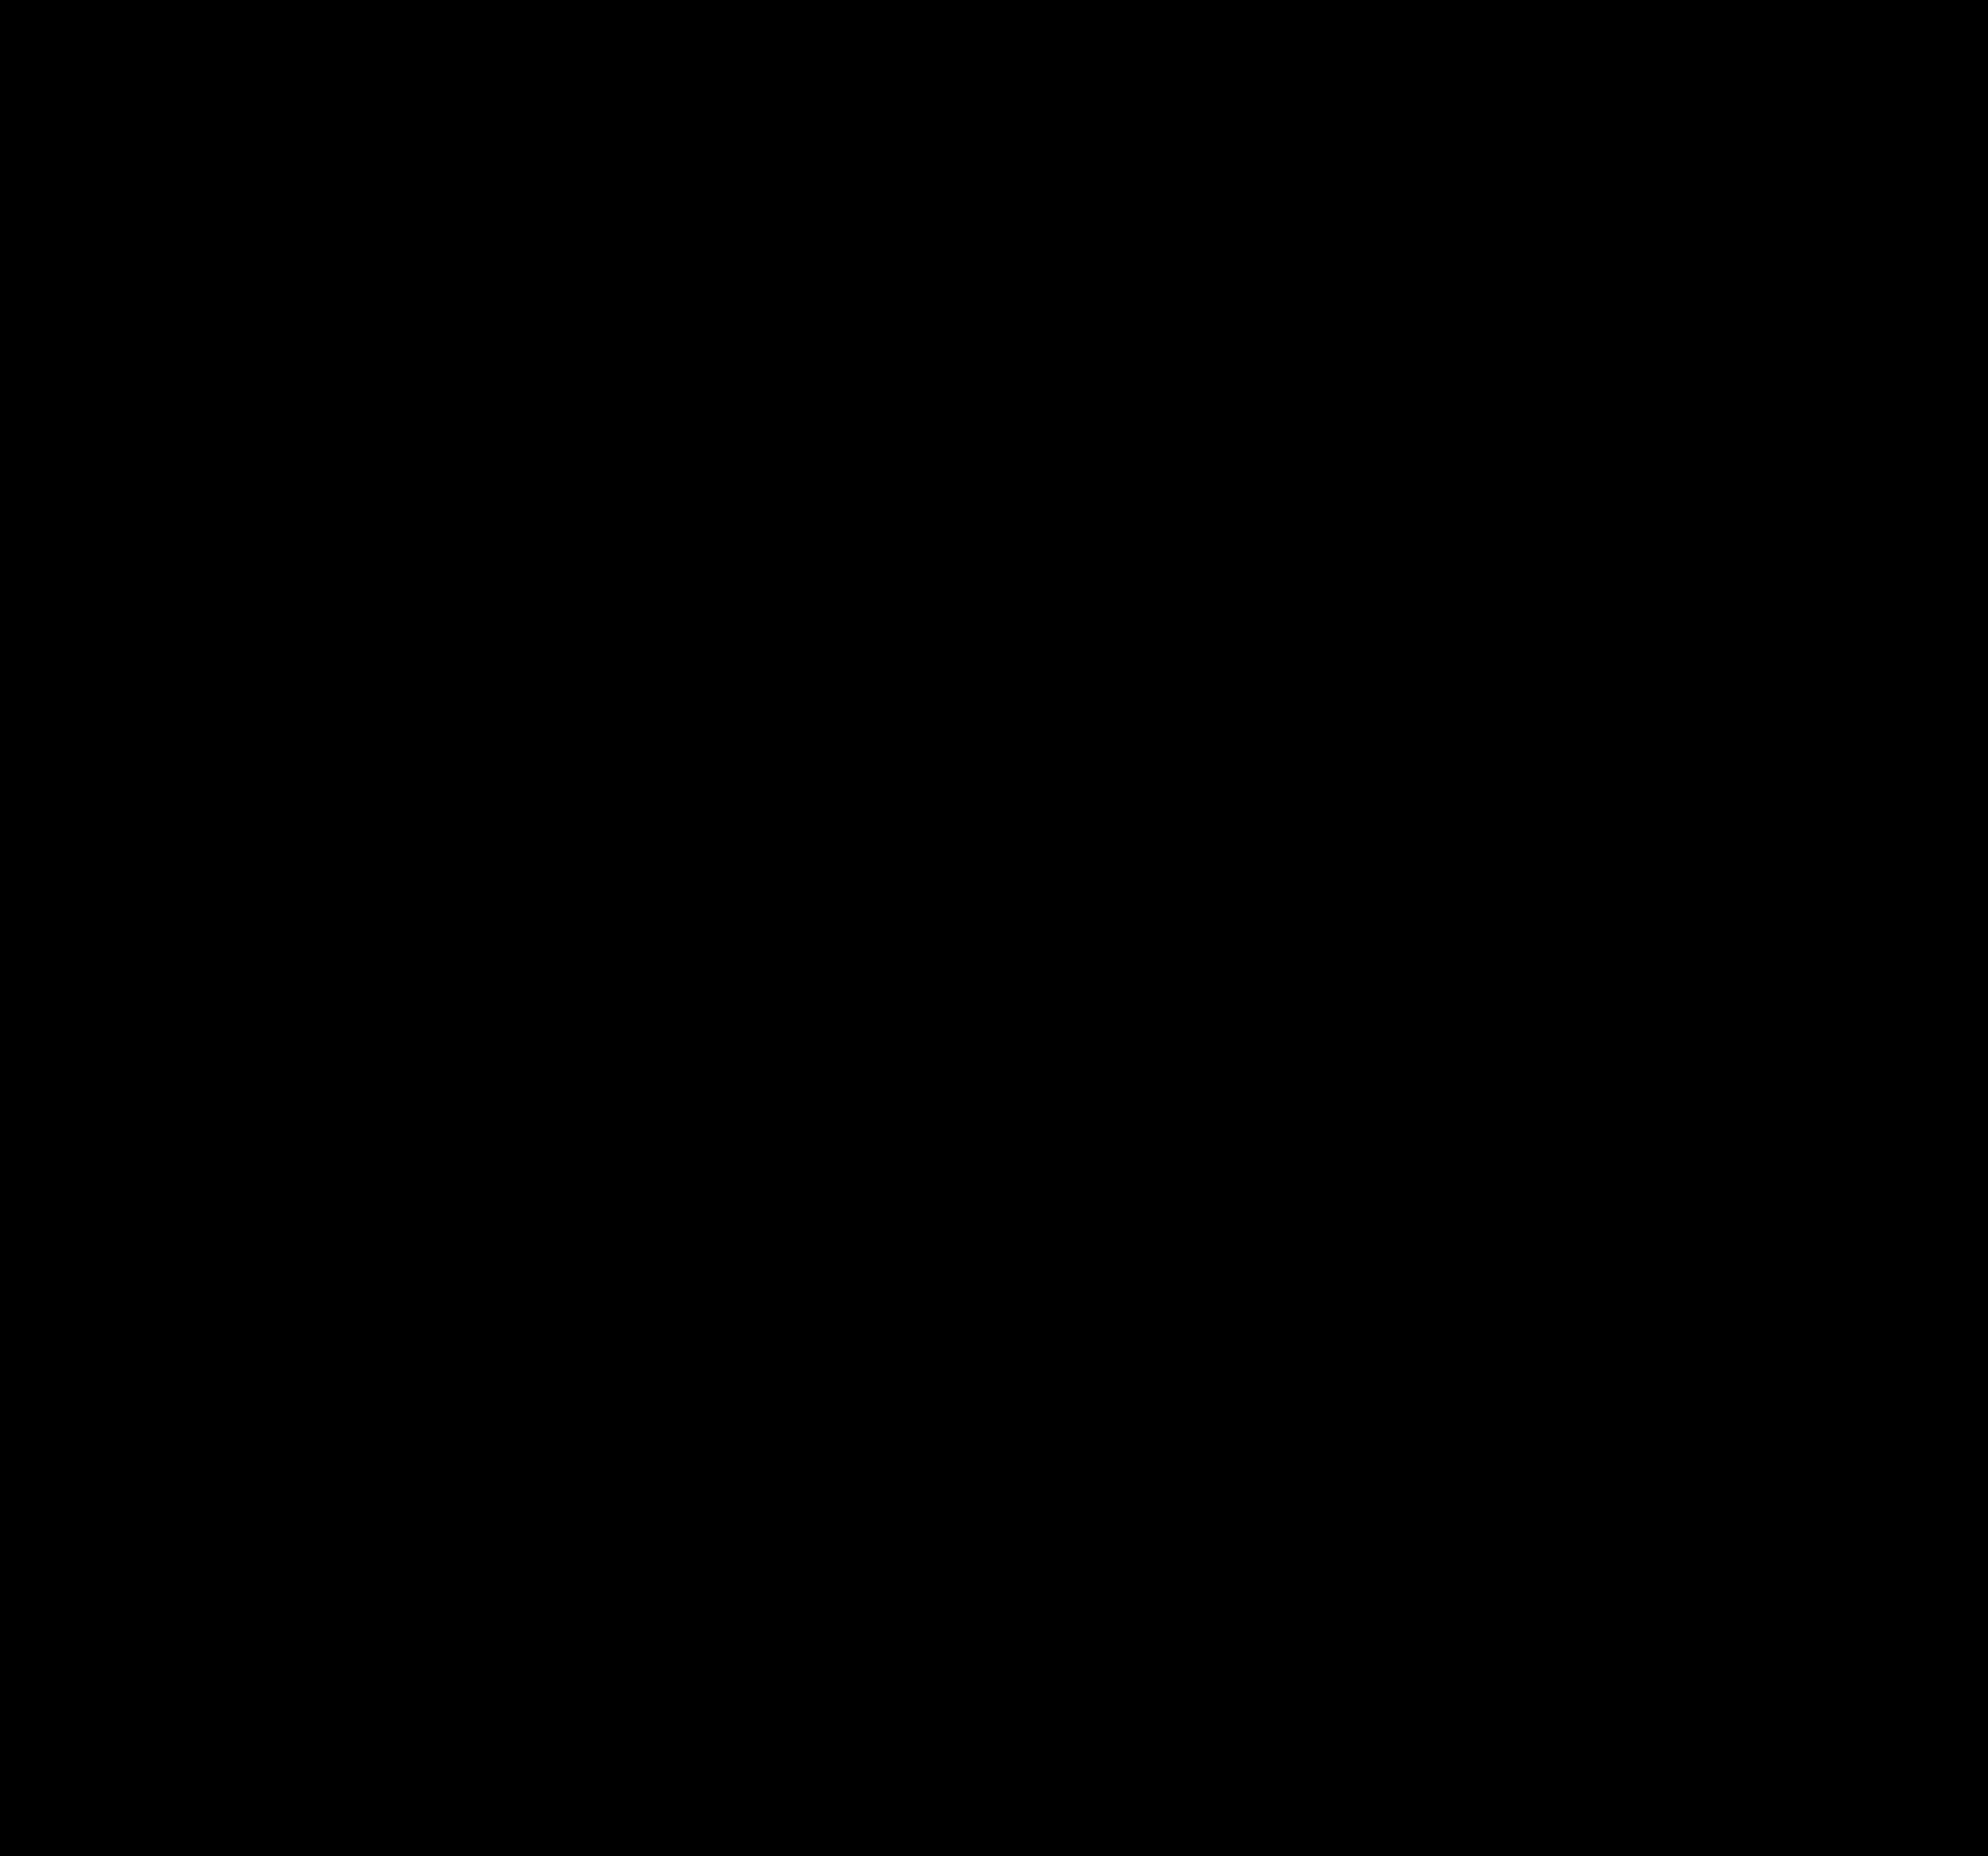 logo-black (7).png